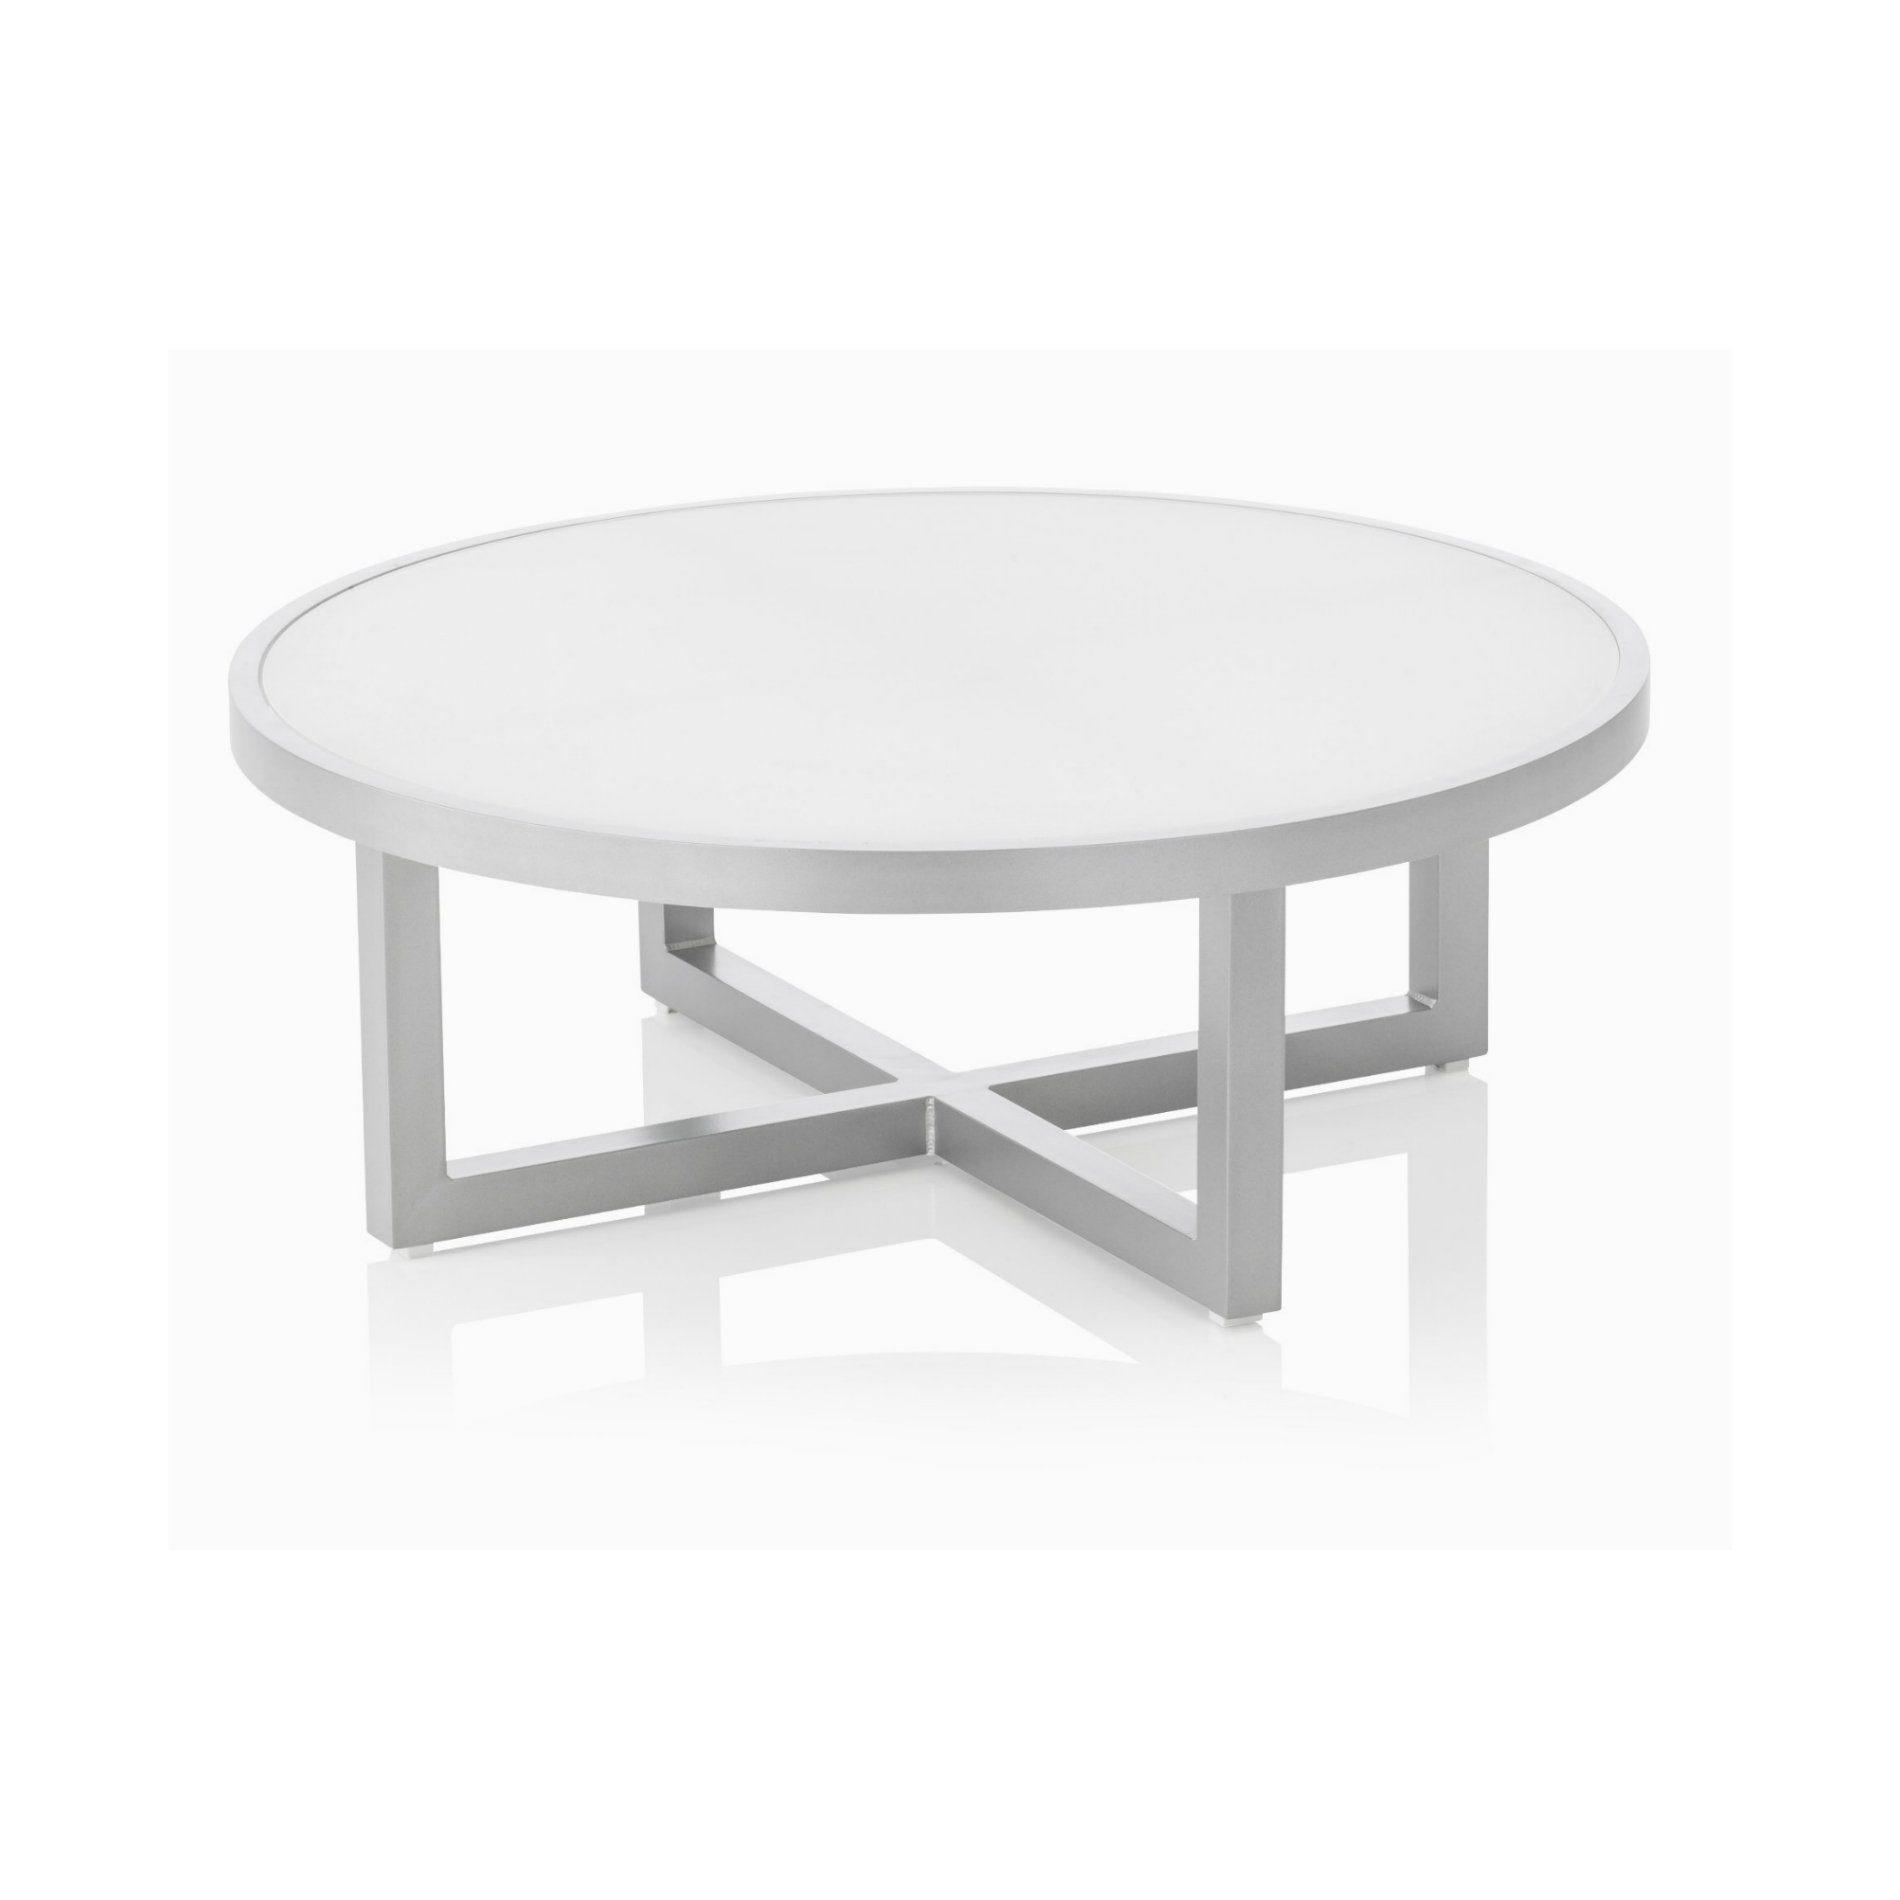 "Kettler ""Ego"" Lounge-Tisch, Aluminiumgestell silber, Tischplatte Glas"